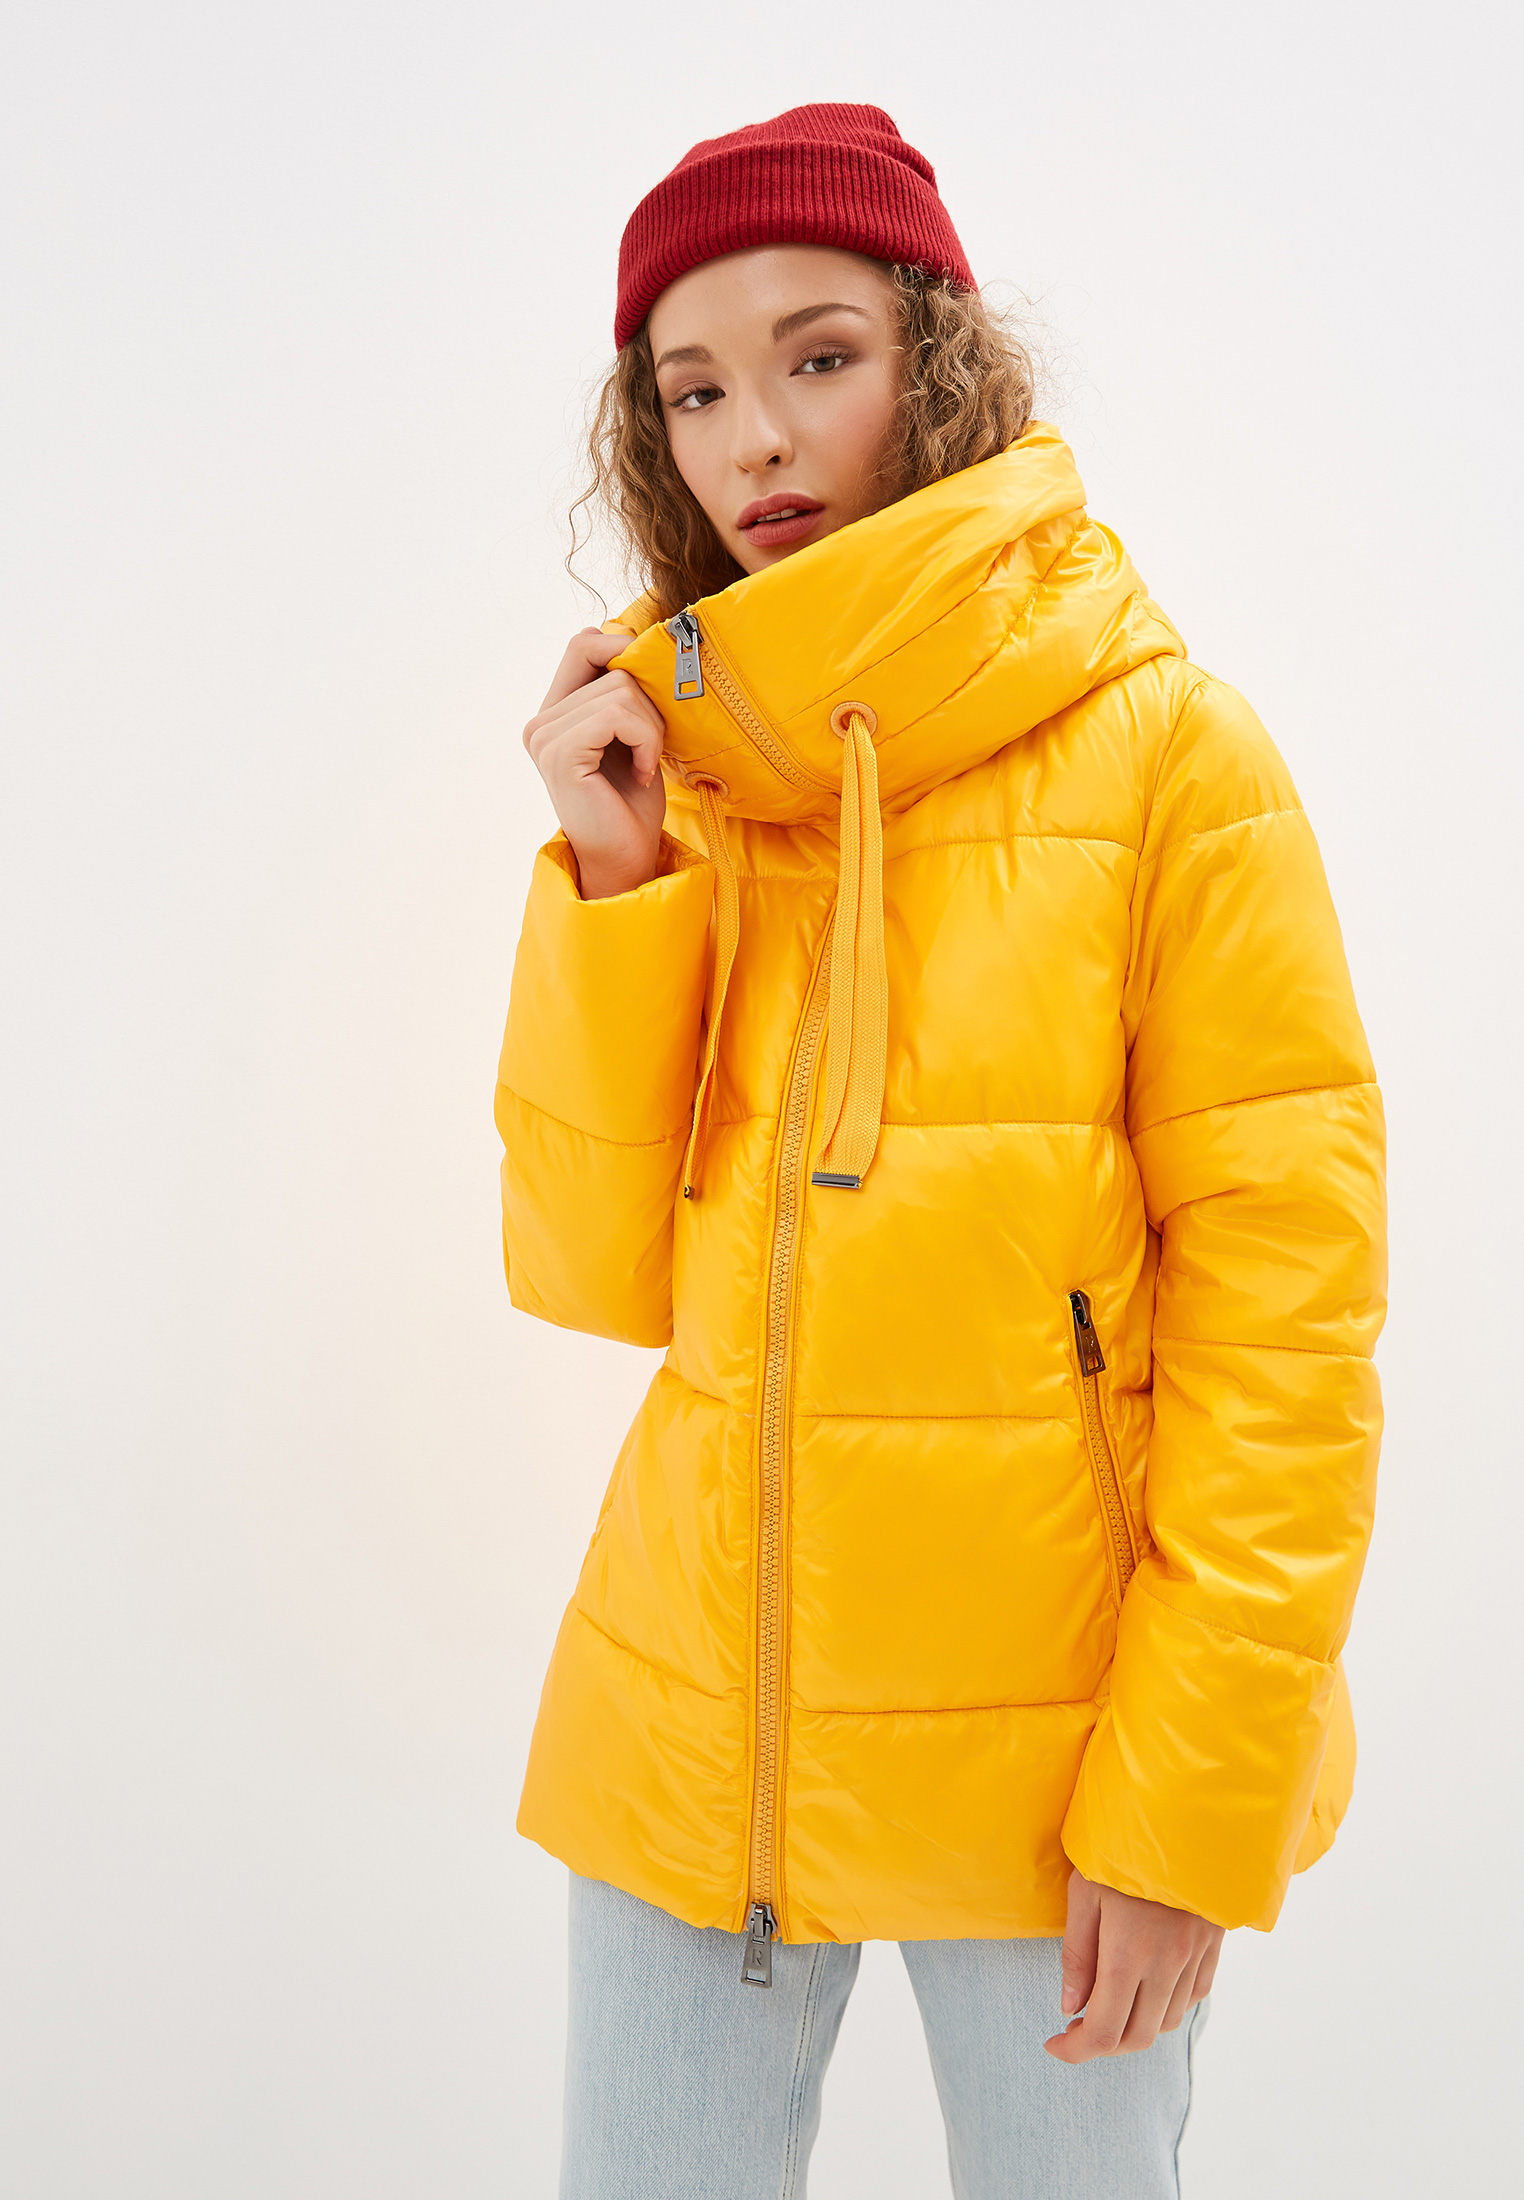 Куртка утепленная, Rinascimento, цвет: желтый. Артикул: RI005EWGAYX5. Одежда / Верхняя одежда